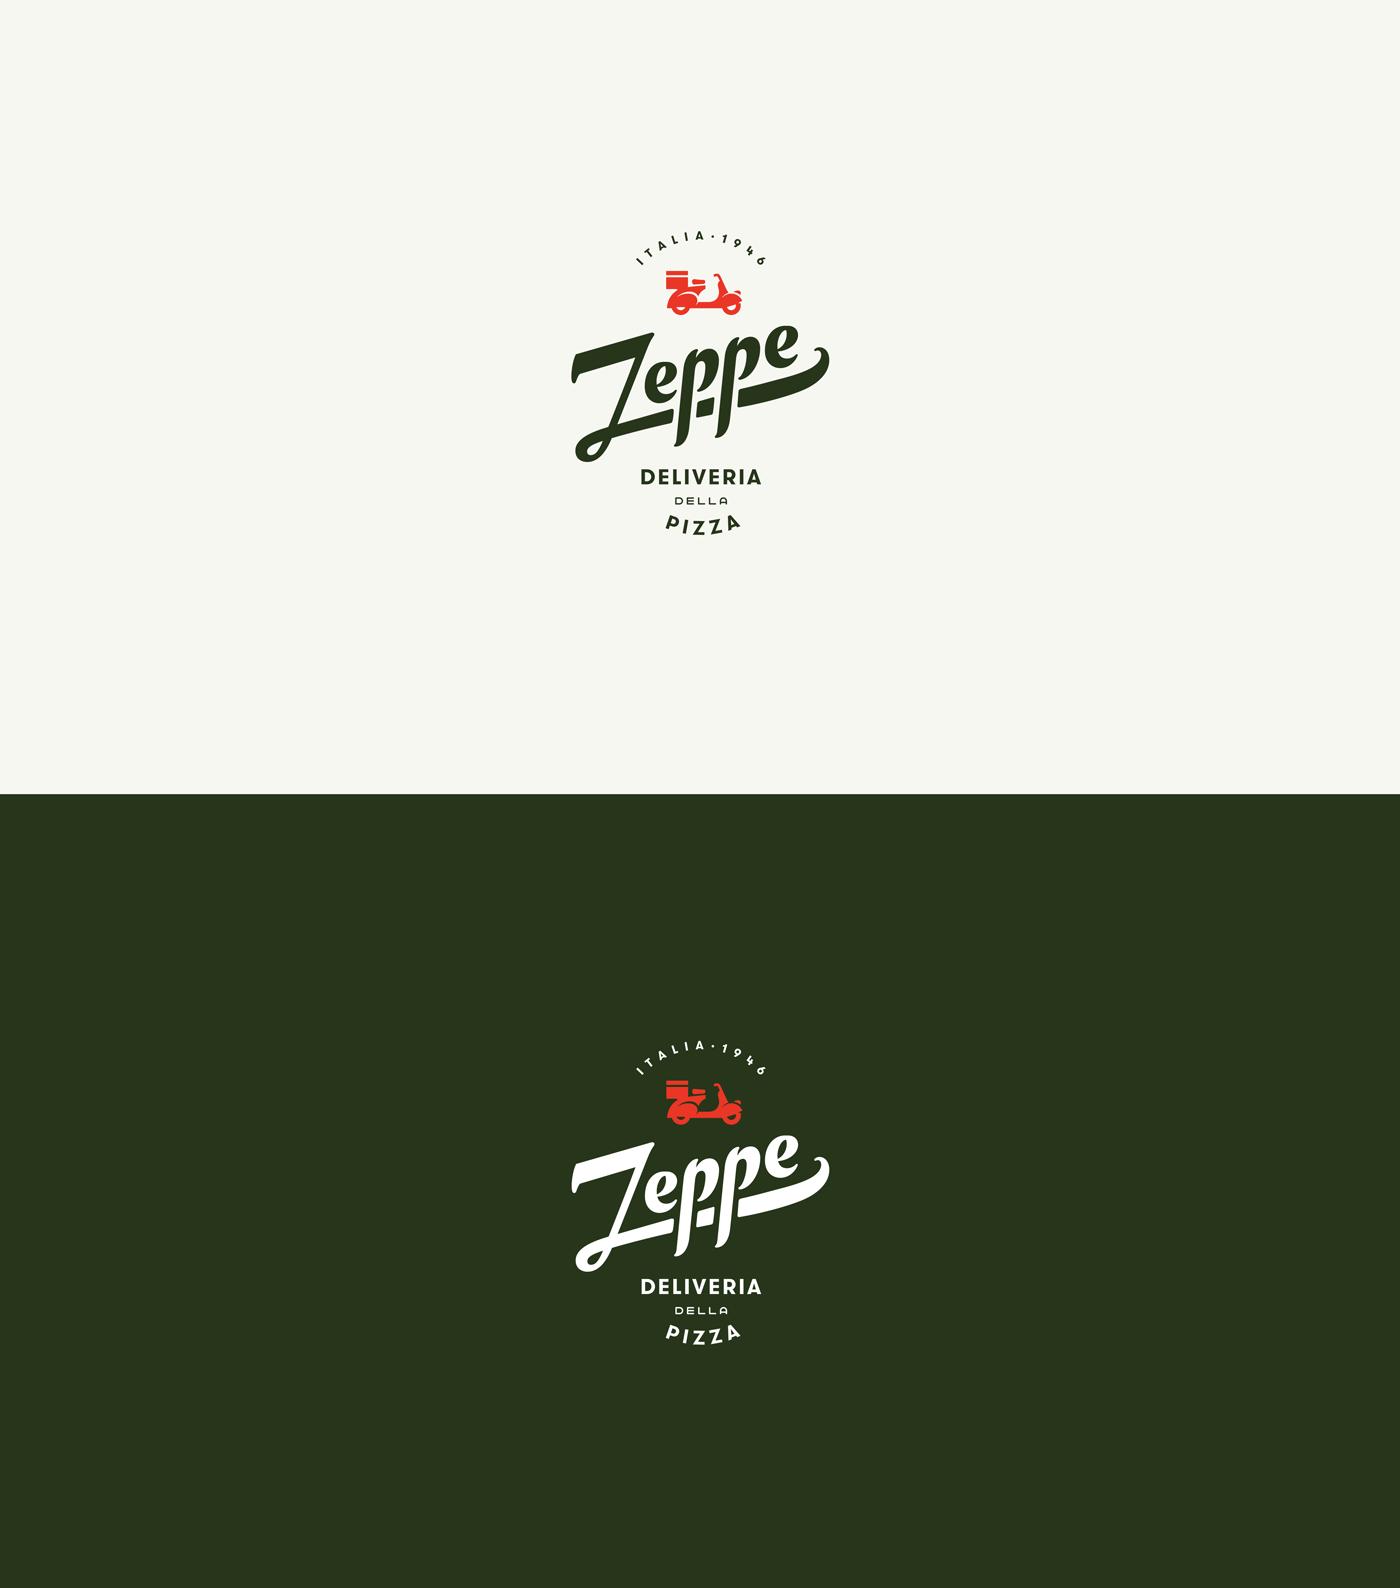 zeppe-restaurante-logo-00